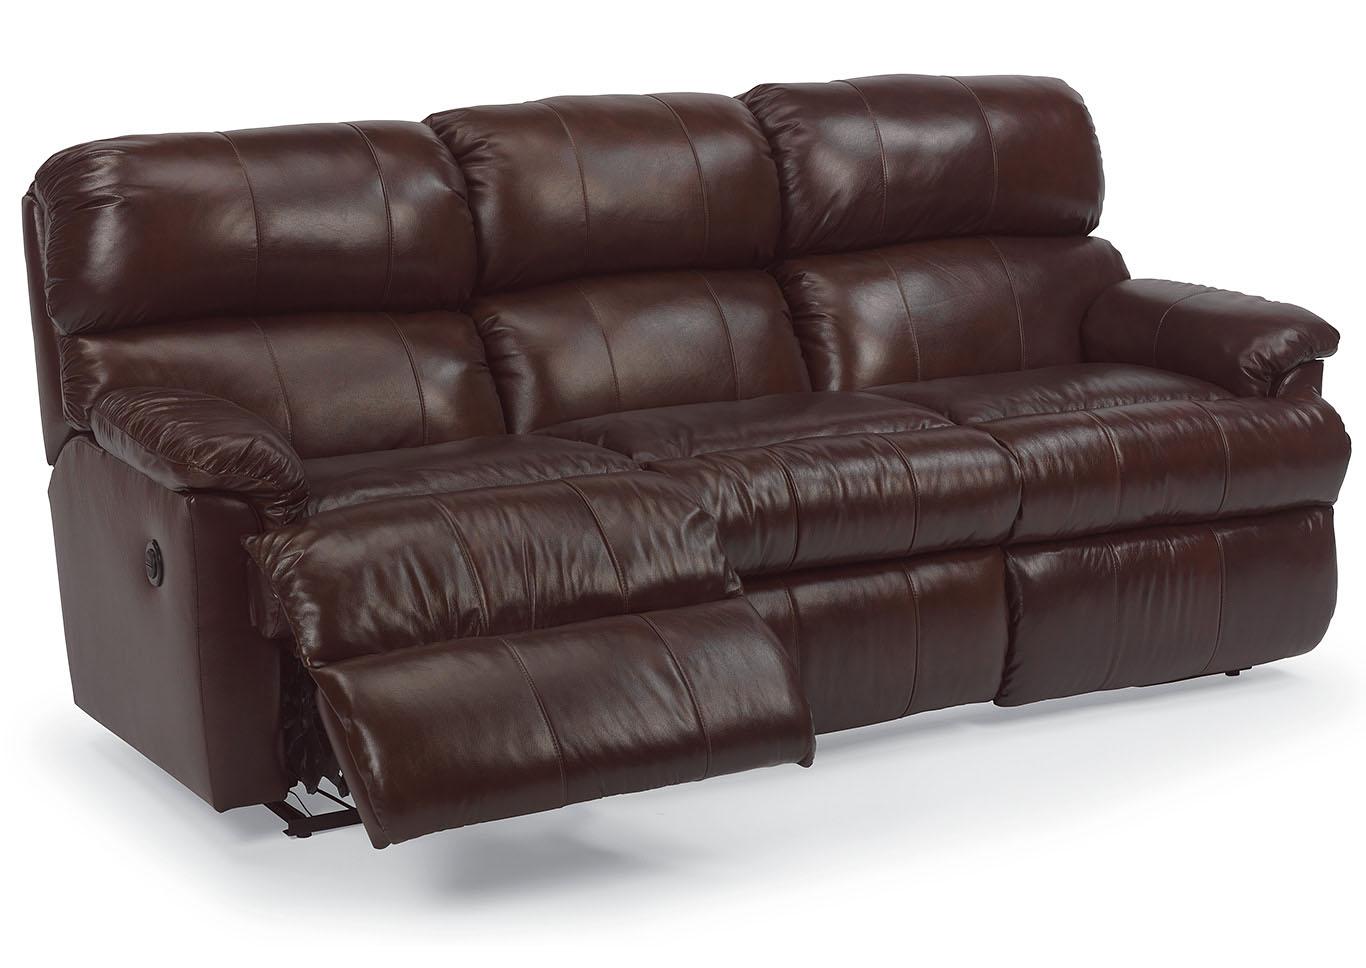 Sofas 2 Furnishings Chicago Leather Power Reclining Sofa